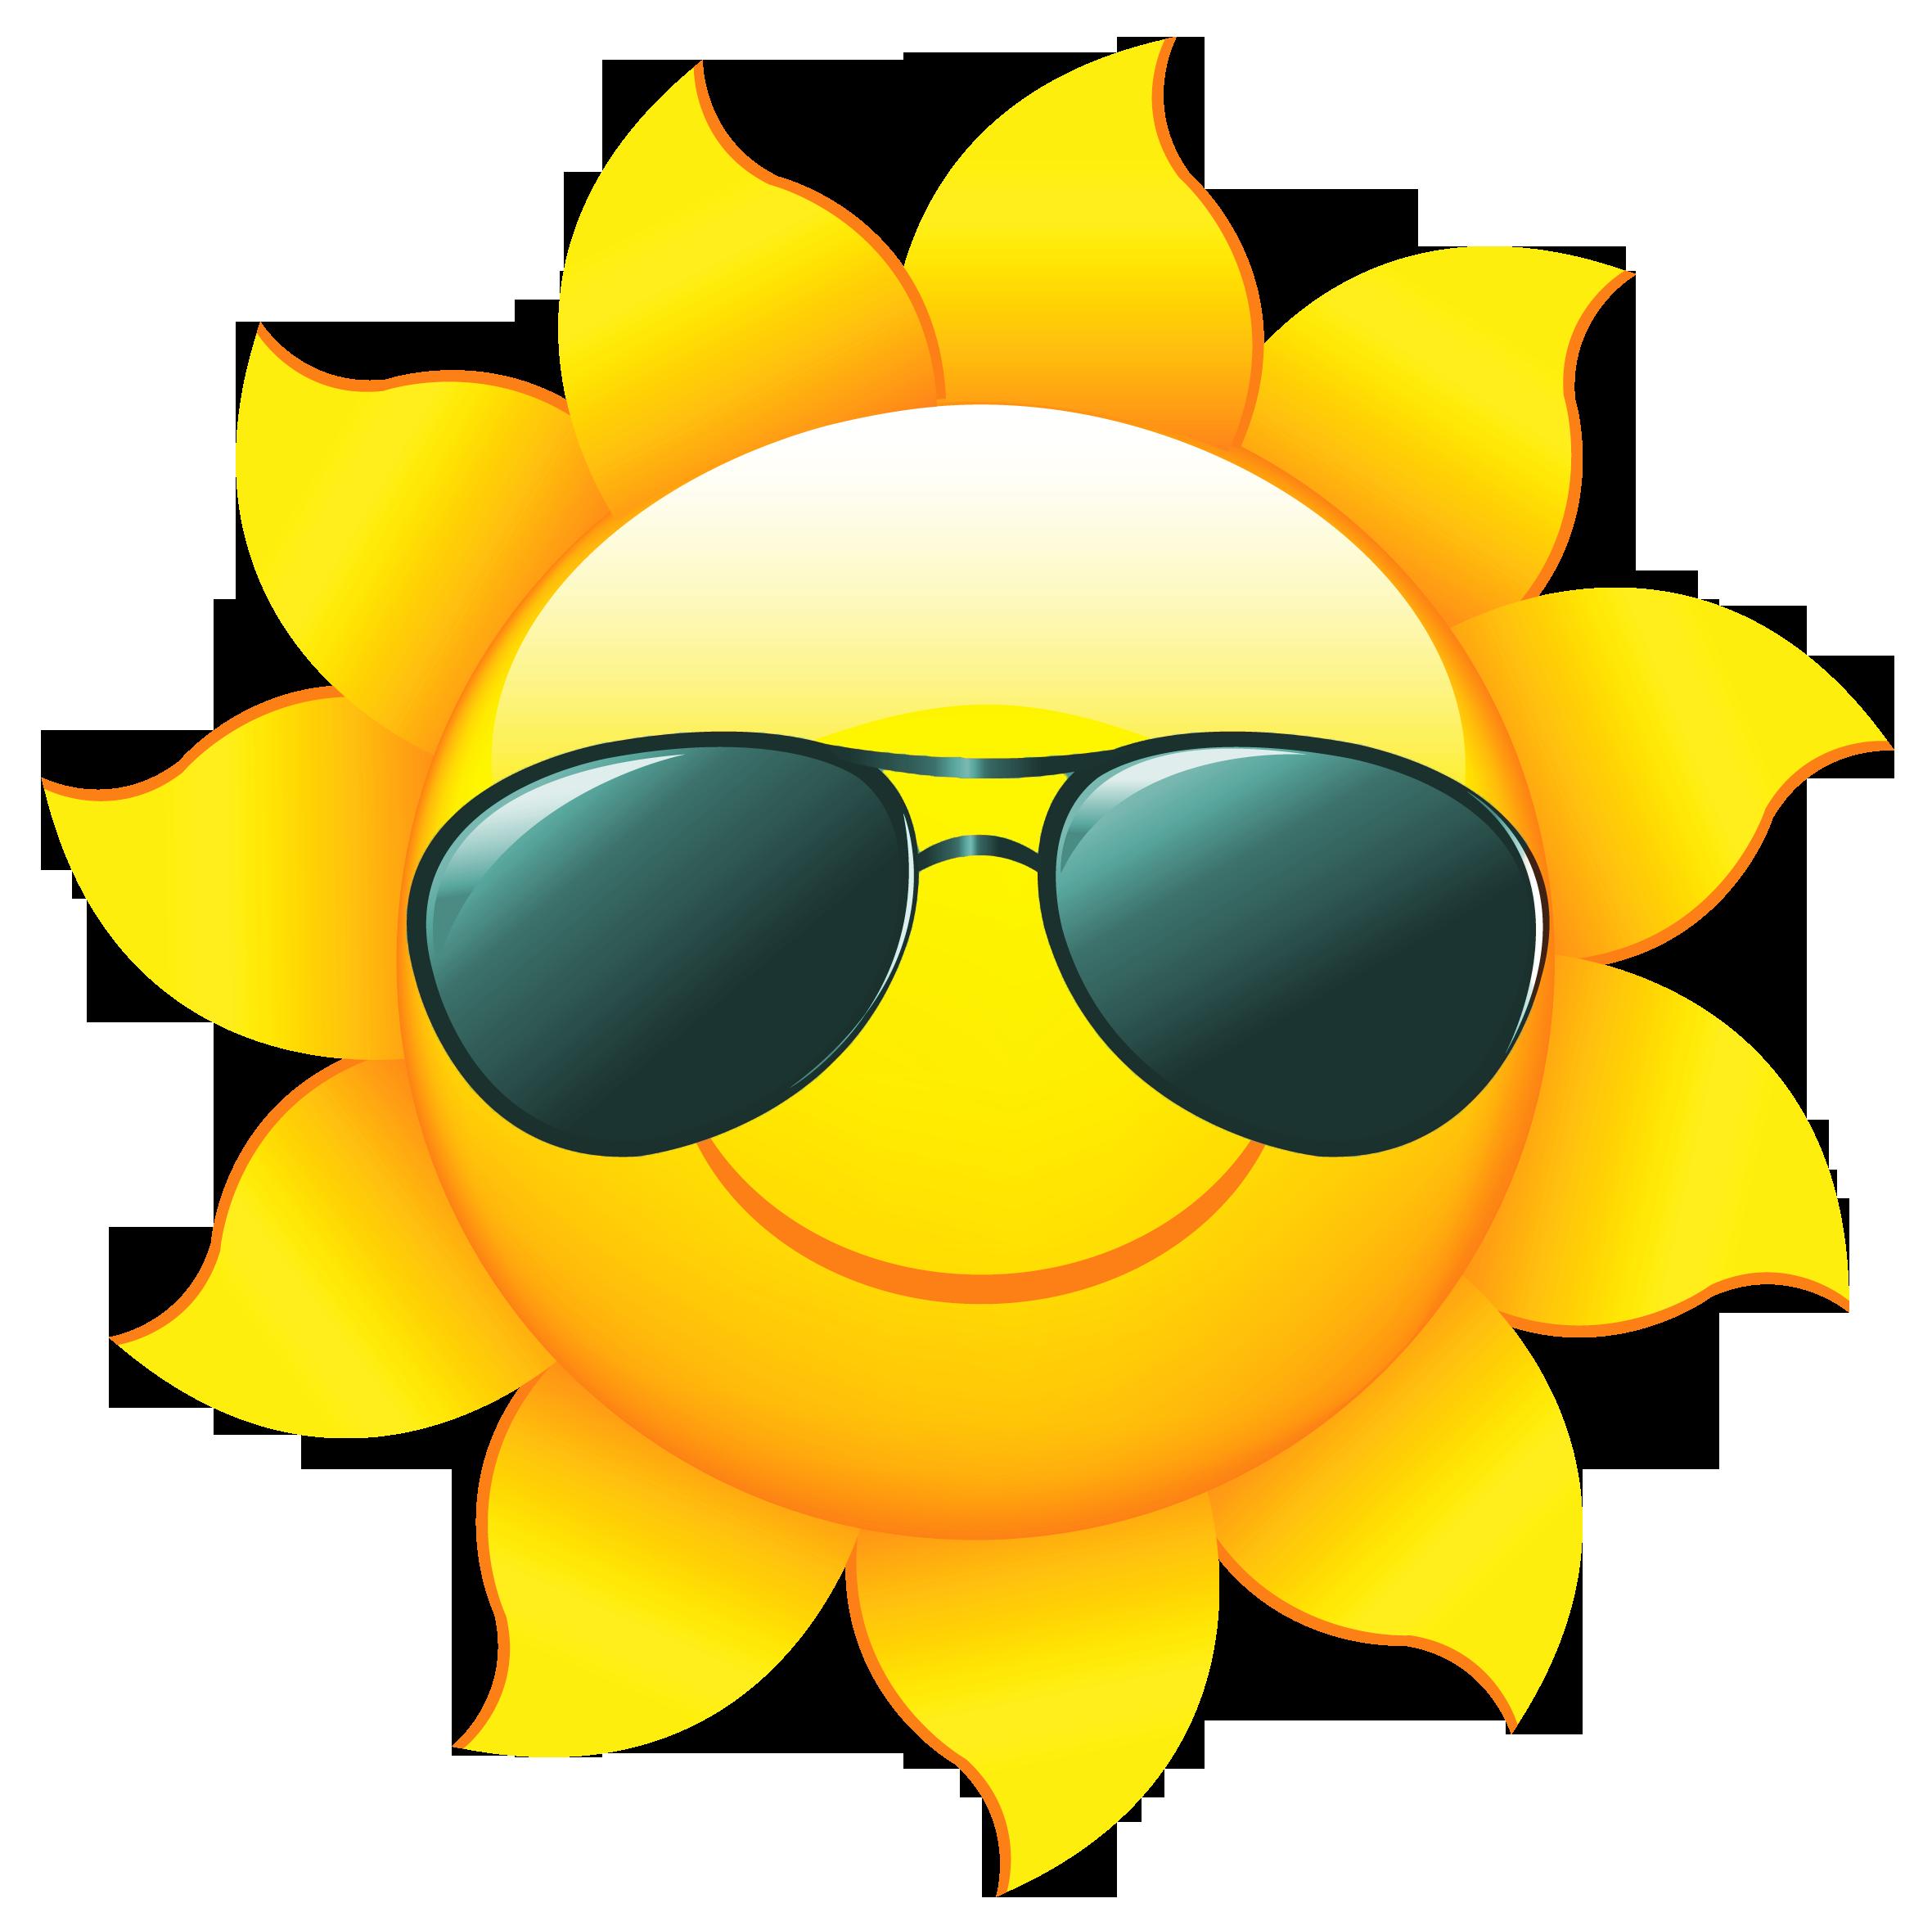 Sunshine Sun Clip Art With Transparent Background Free - Art PNG Transparent Background